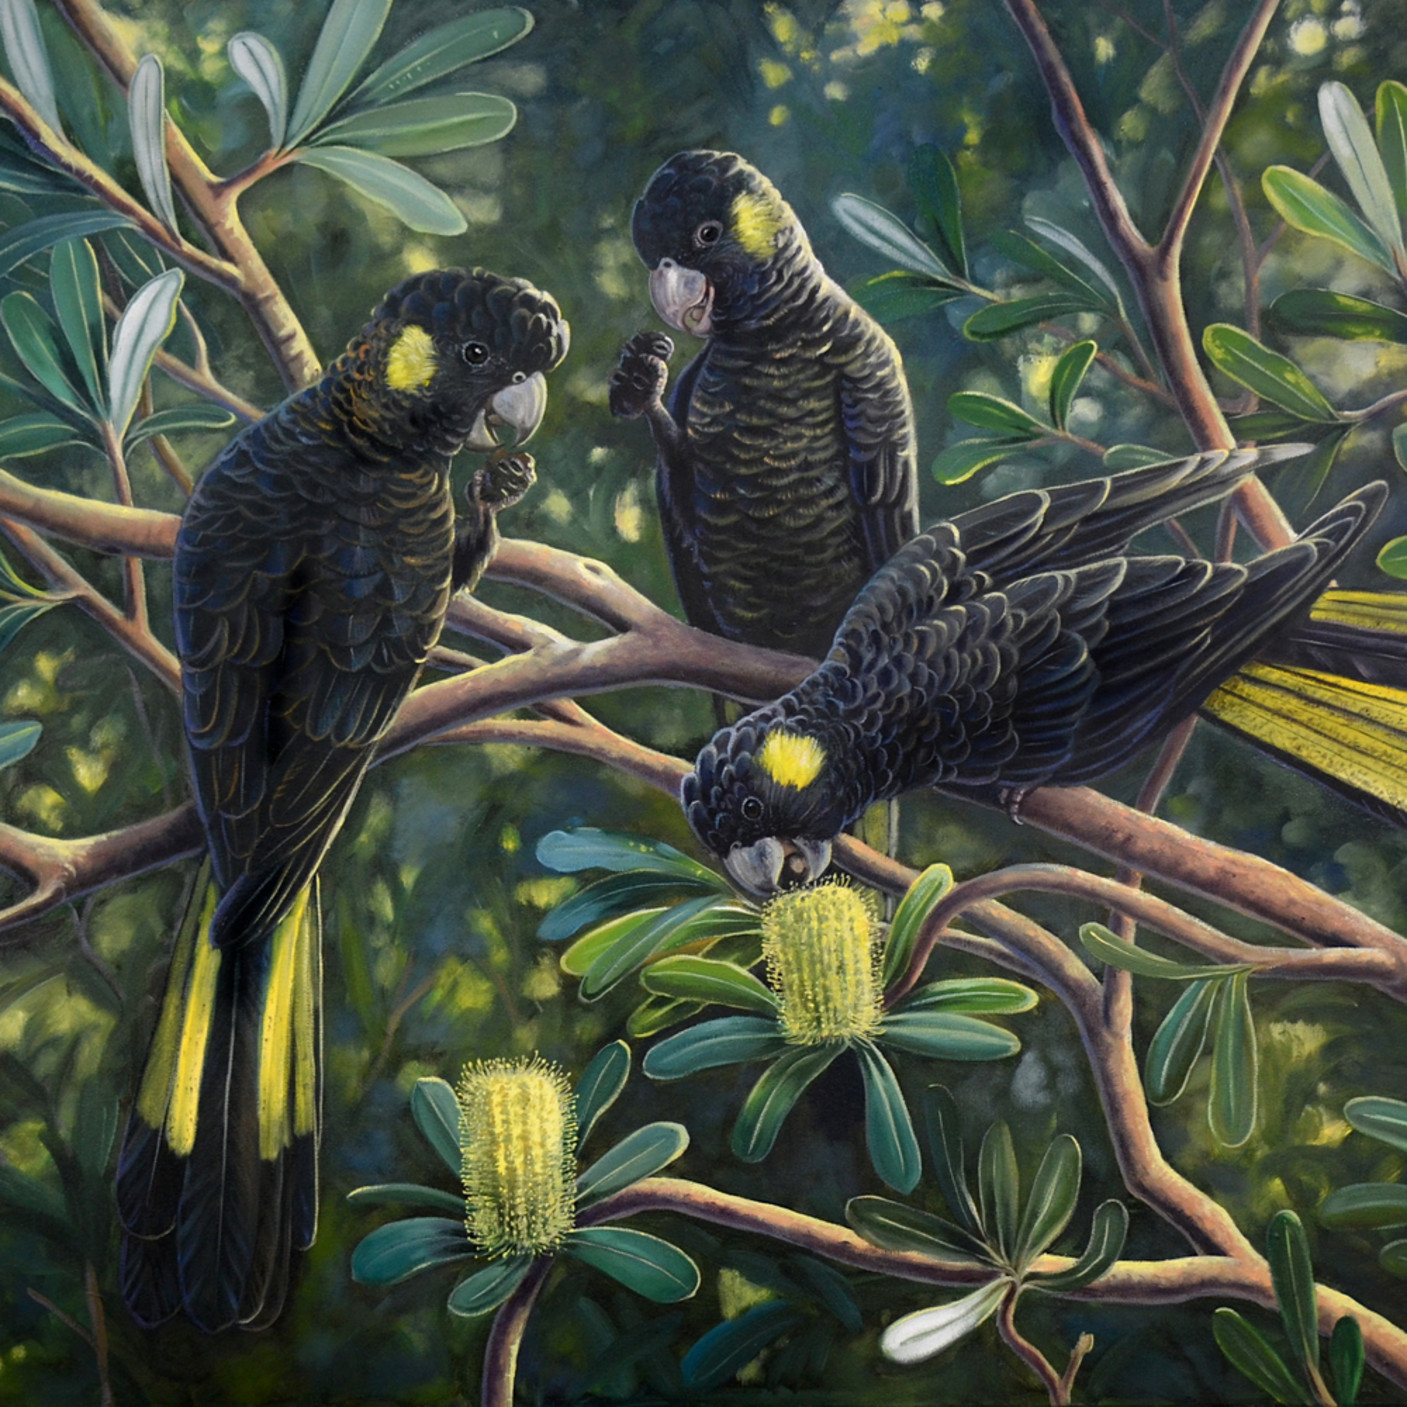 Yellow tailed black cockatoos socialmedia xobhx3